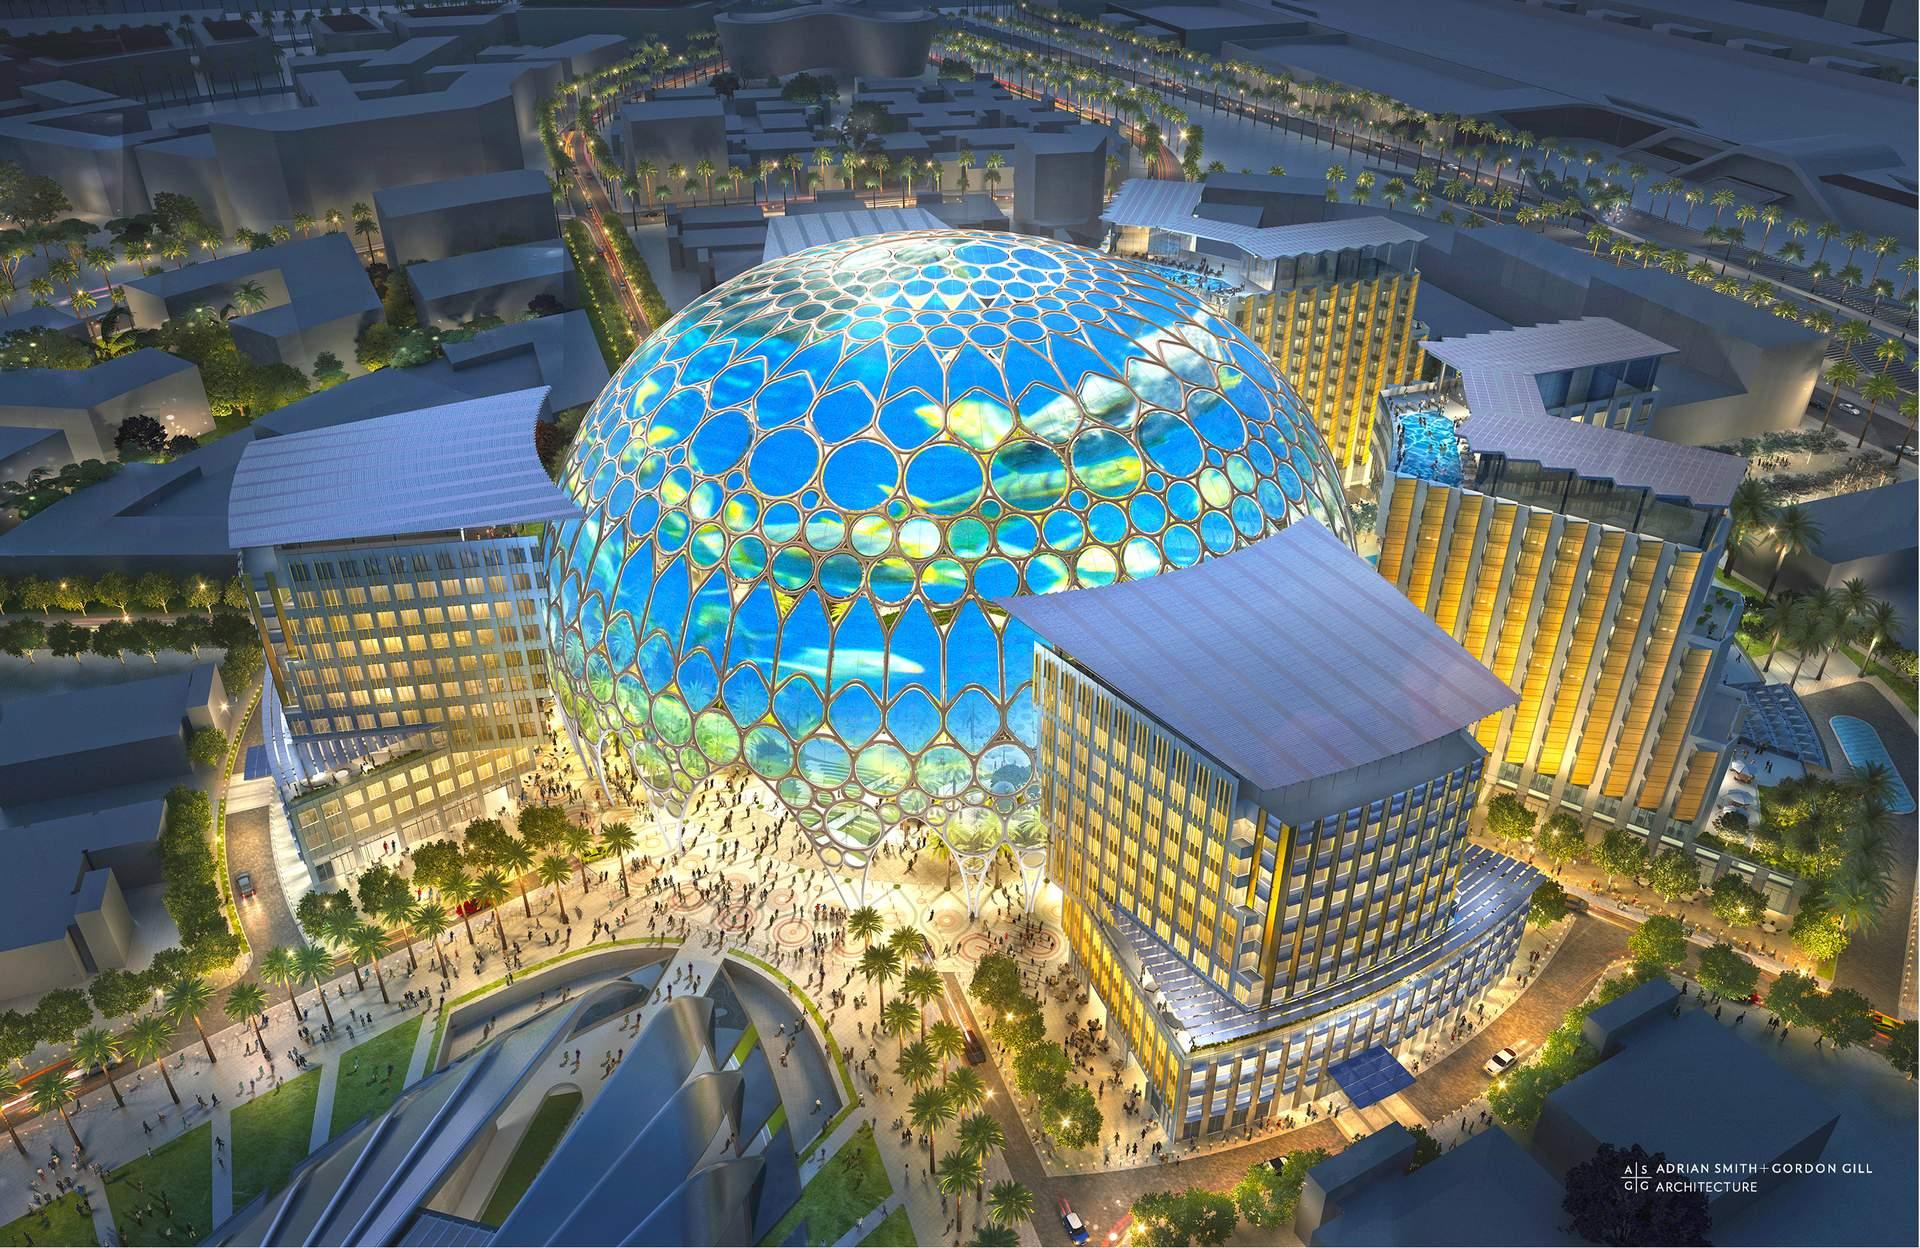 Dubai: Al Wasl Plaza Illustration - Quelle: GLOBALIS